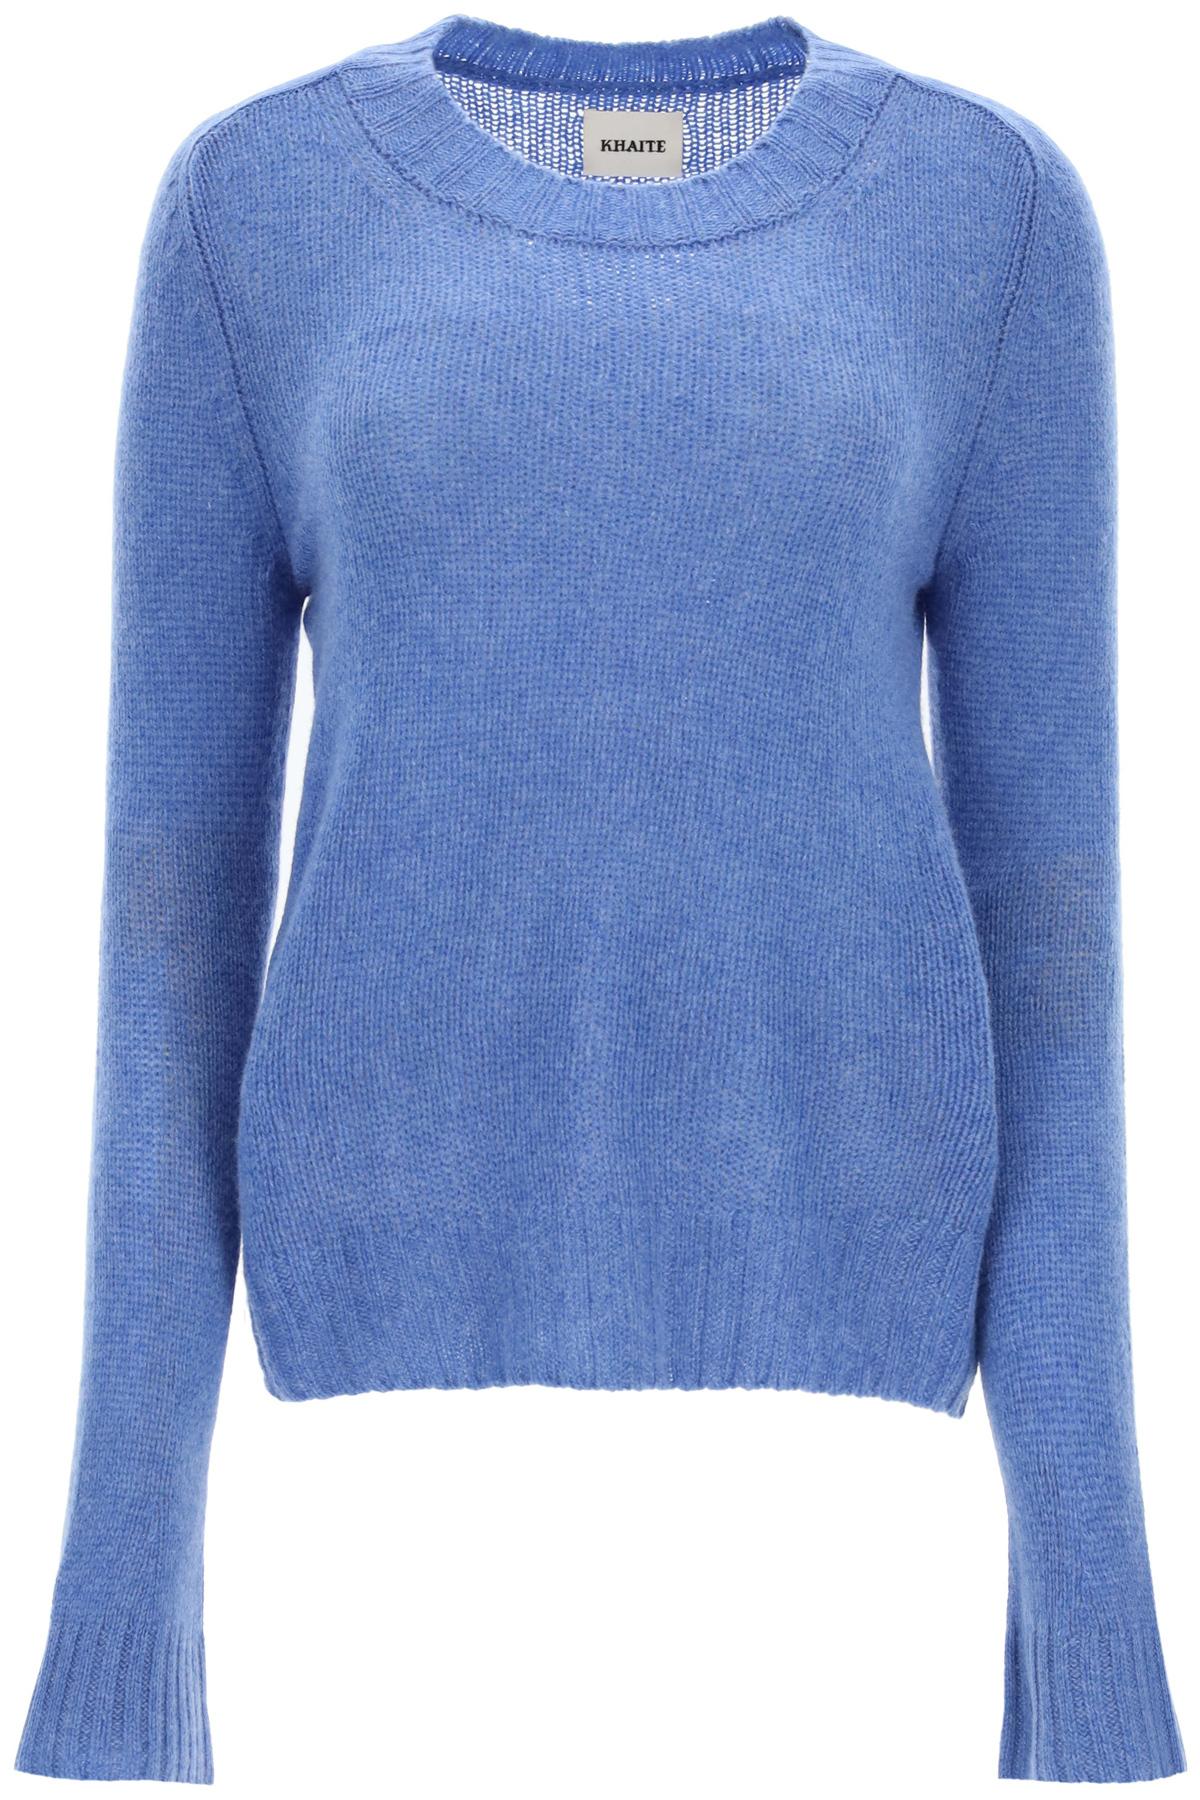 Khaite pullover mary jane in cachemire